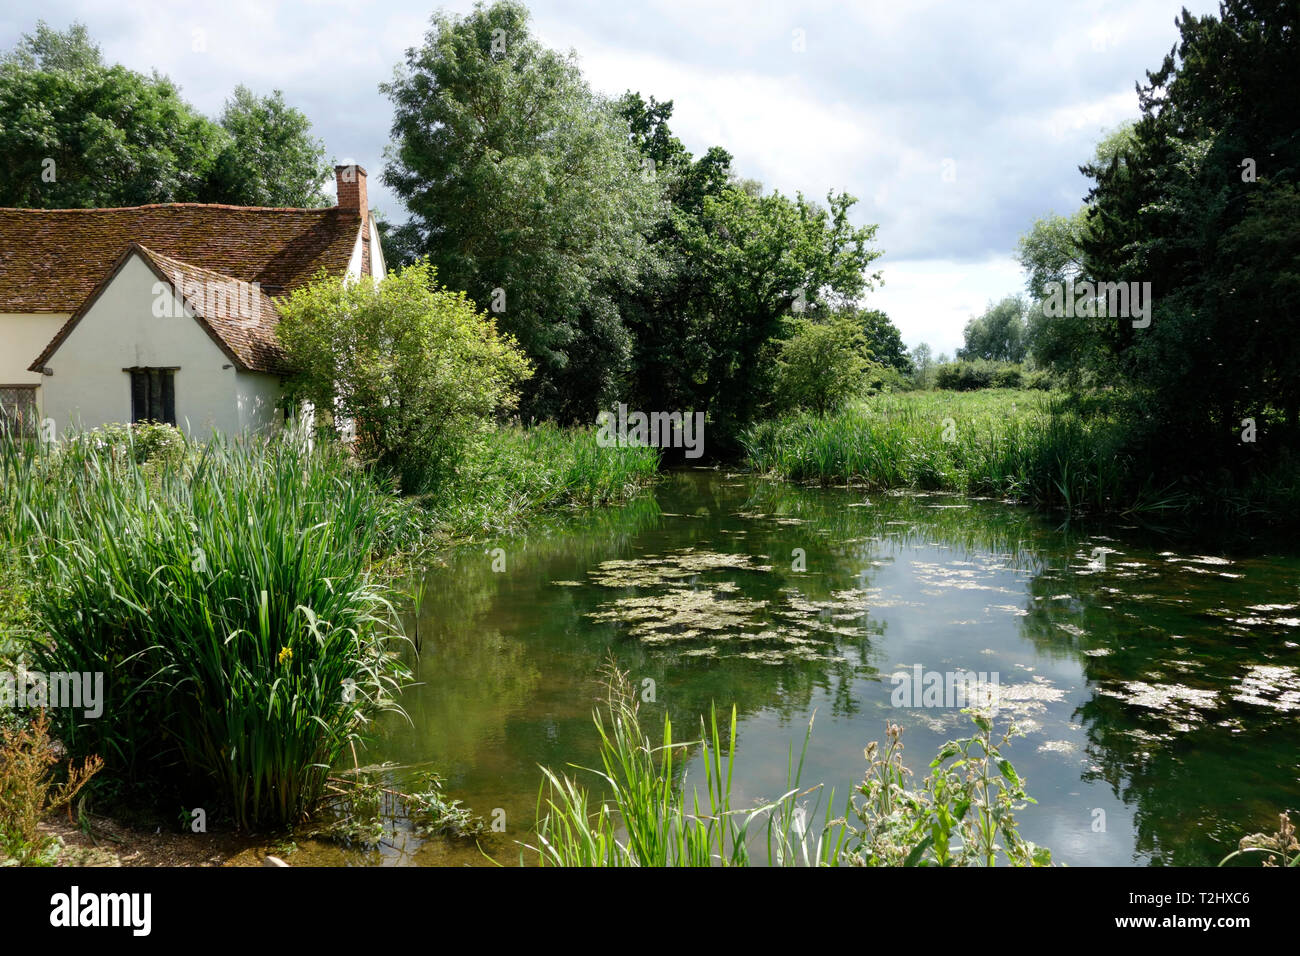 "Scene of the John Constable painting ""The Hay Wain"" Stock Photo"